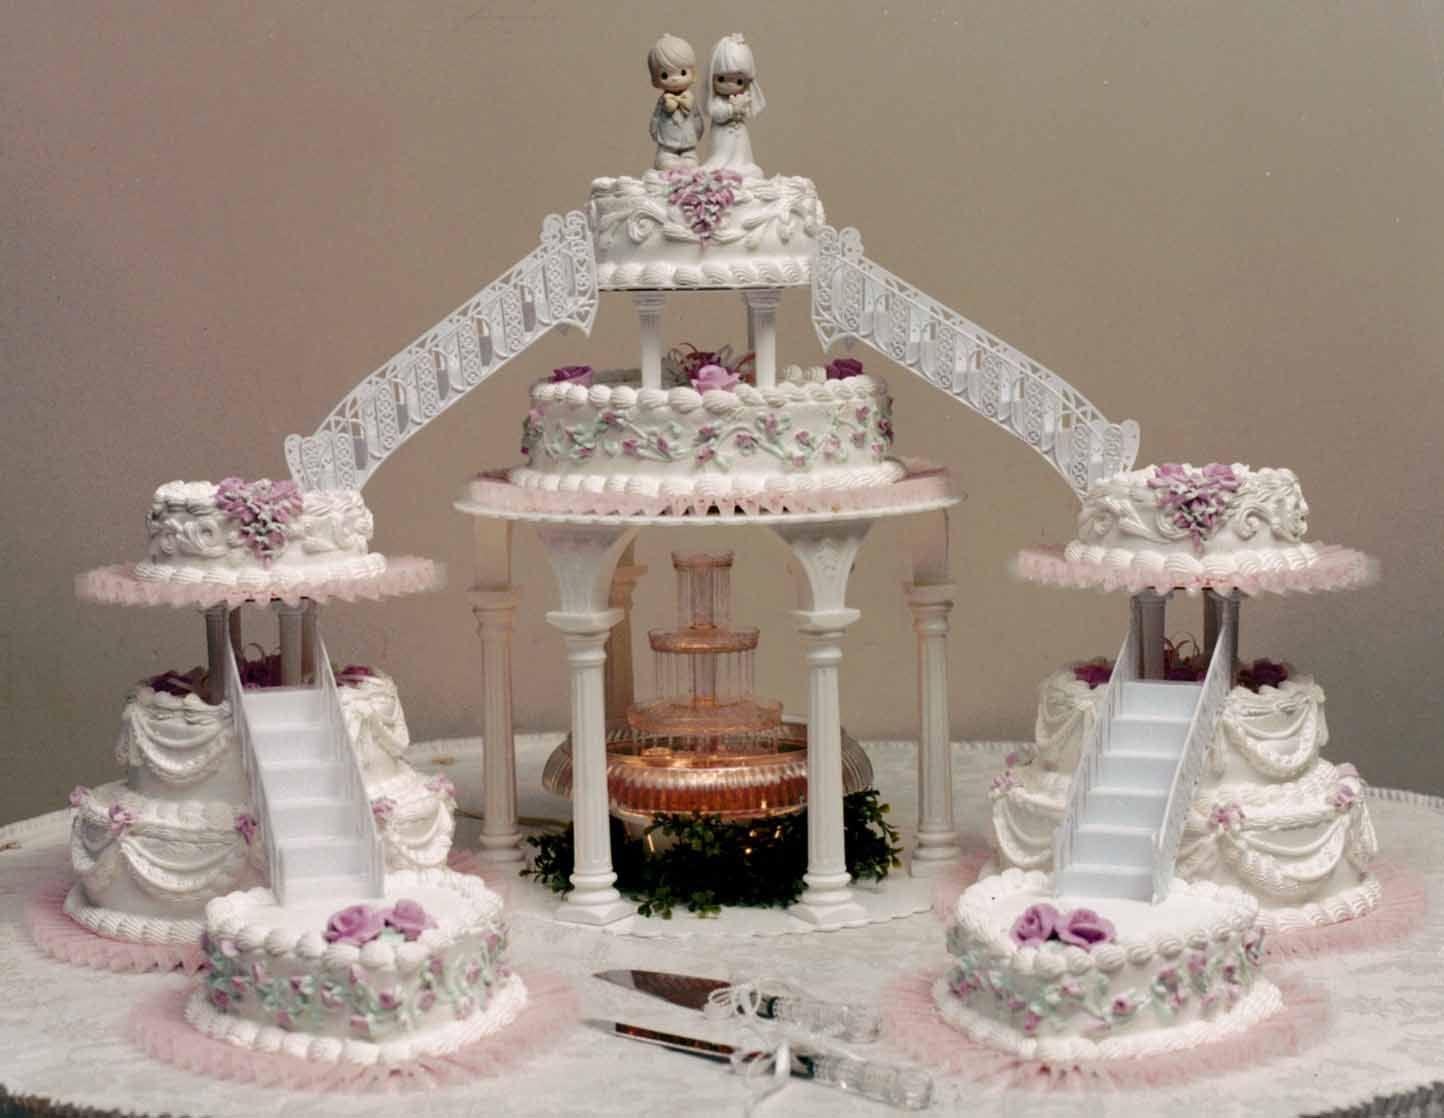 Best 25 Lavender heart shaped wedding cakes ideas on Pinterest